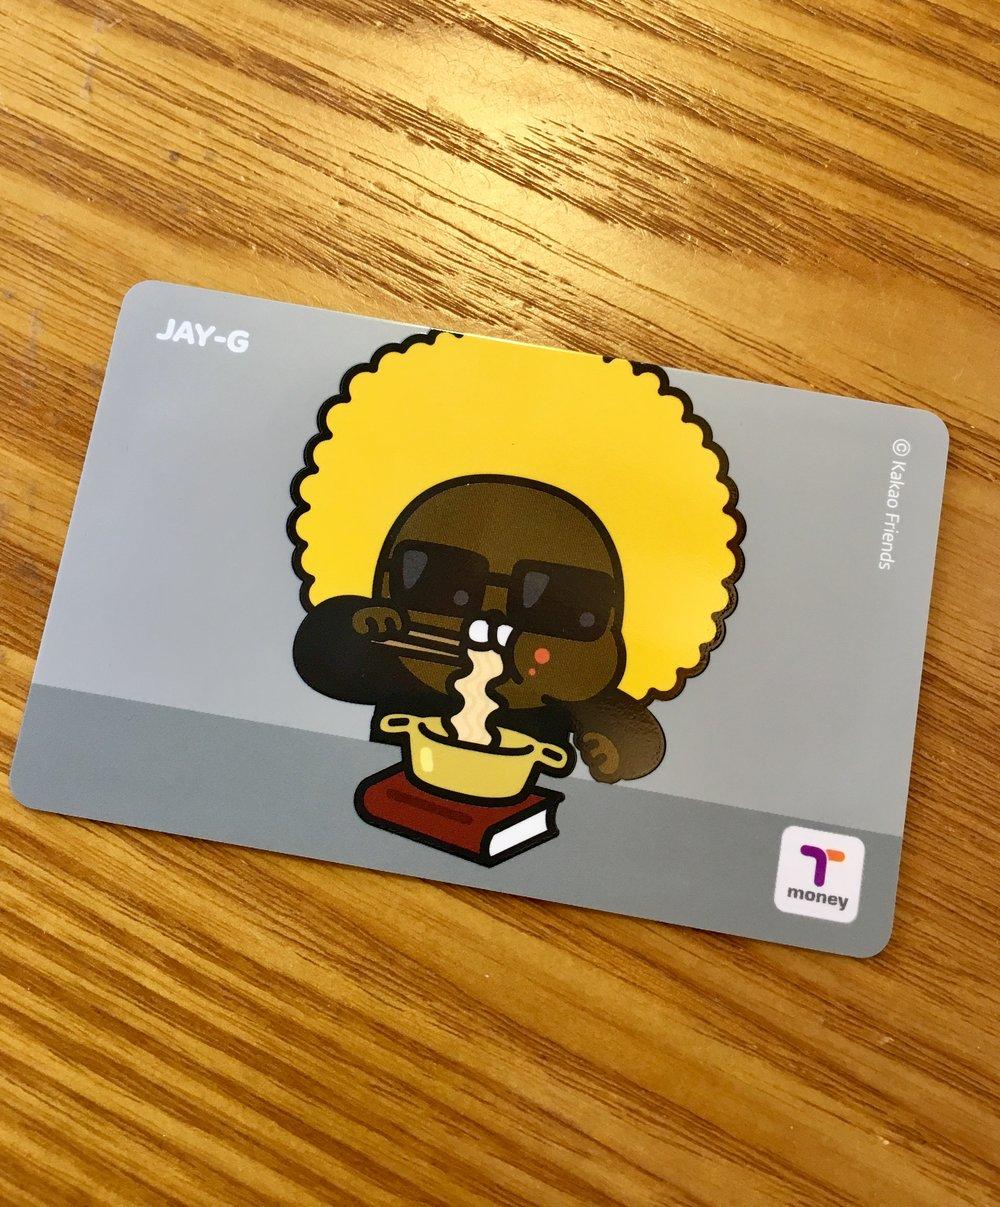 Jay-G Korean T Money Transit Card